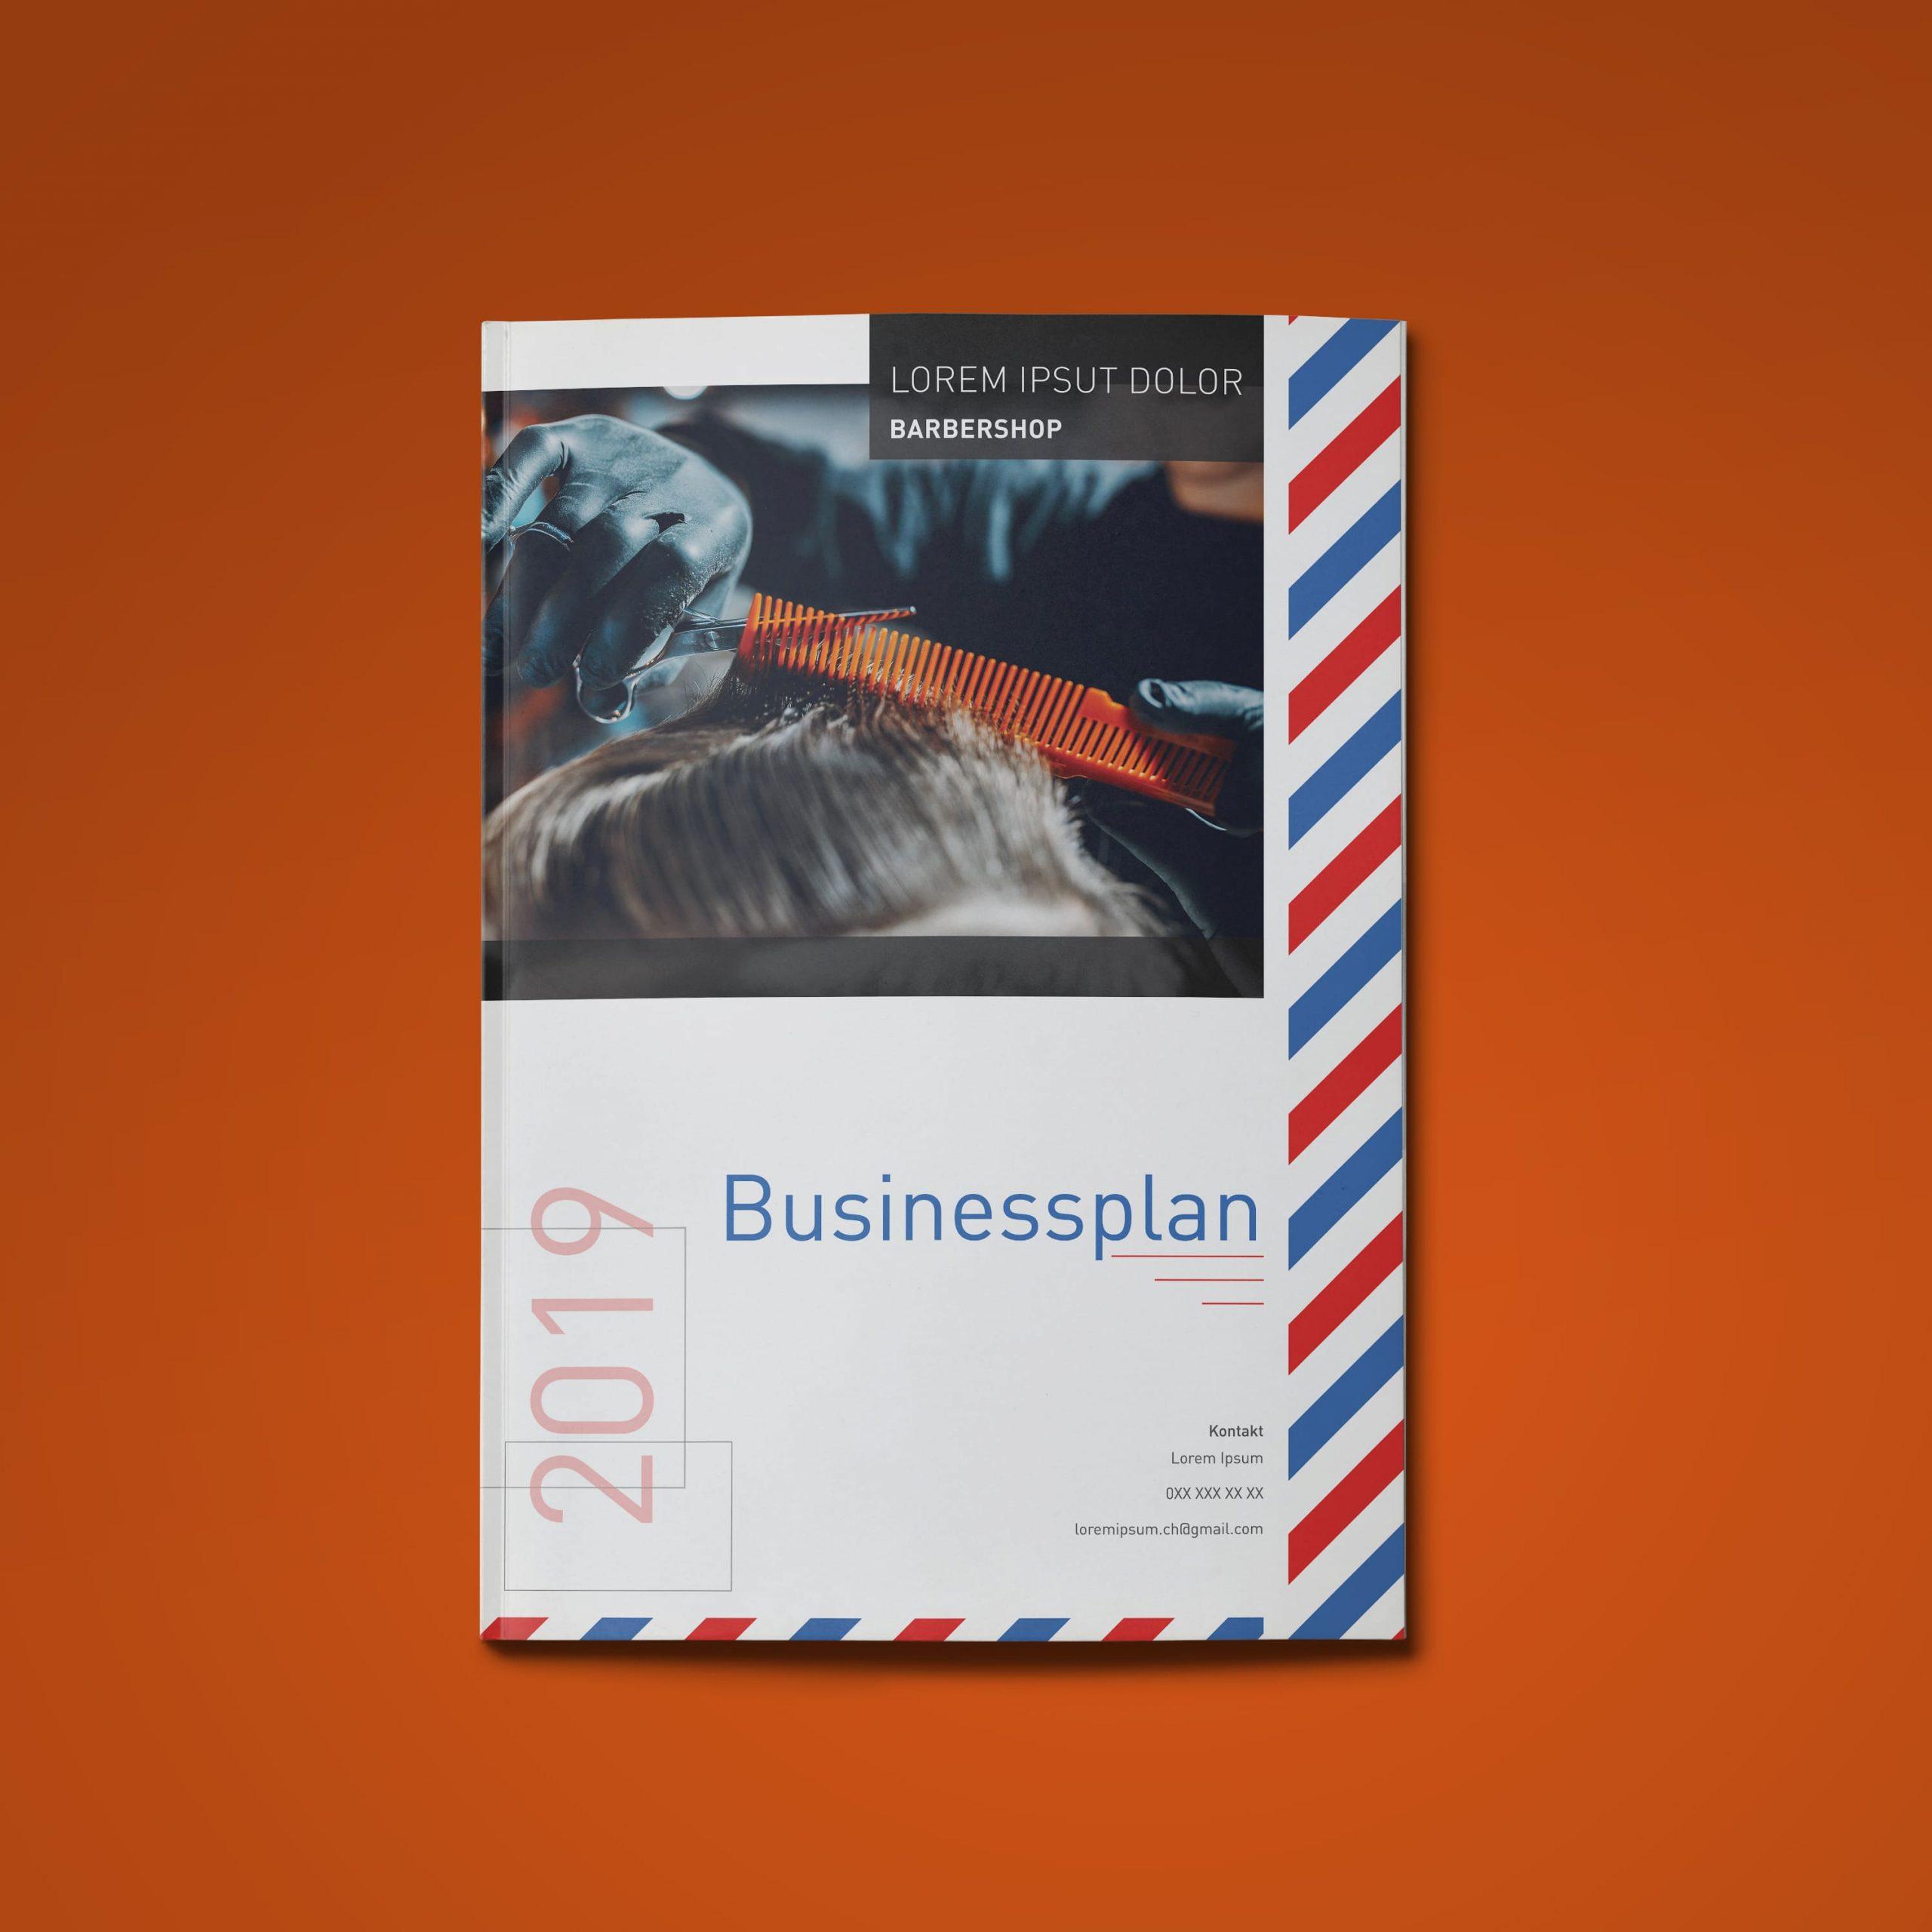 Barbershop Businessplan